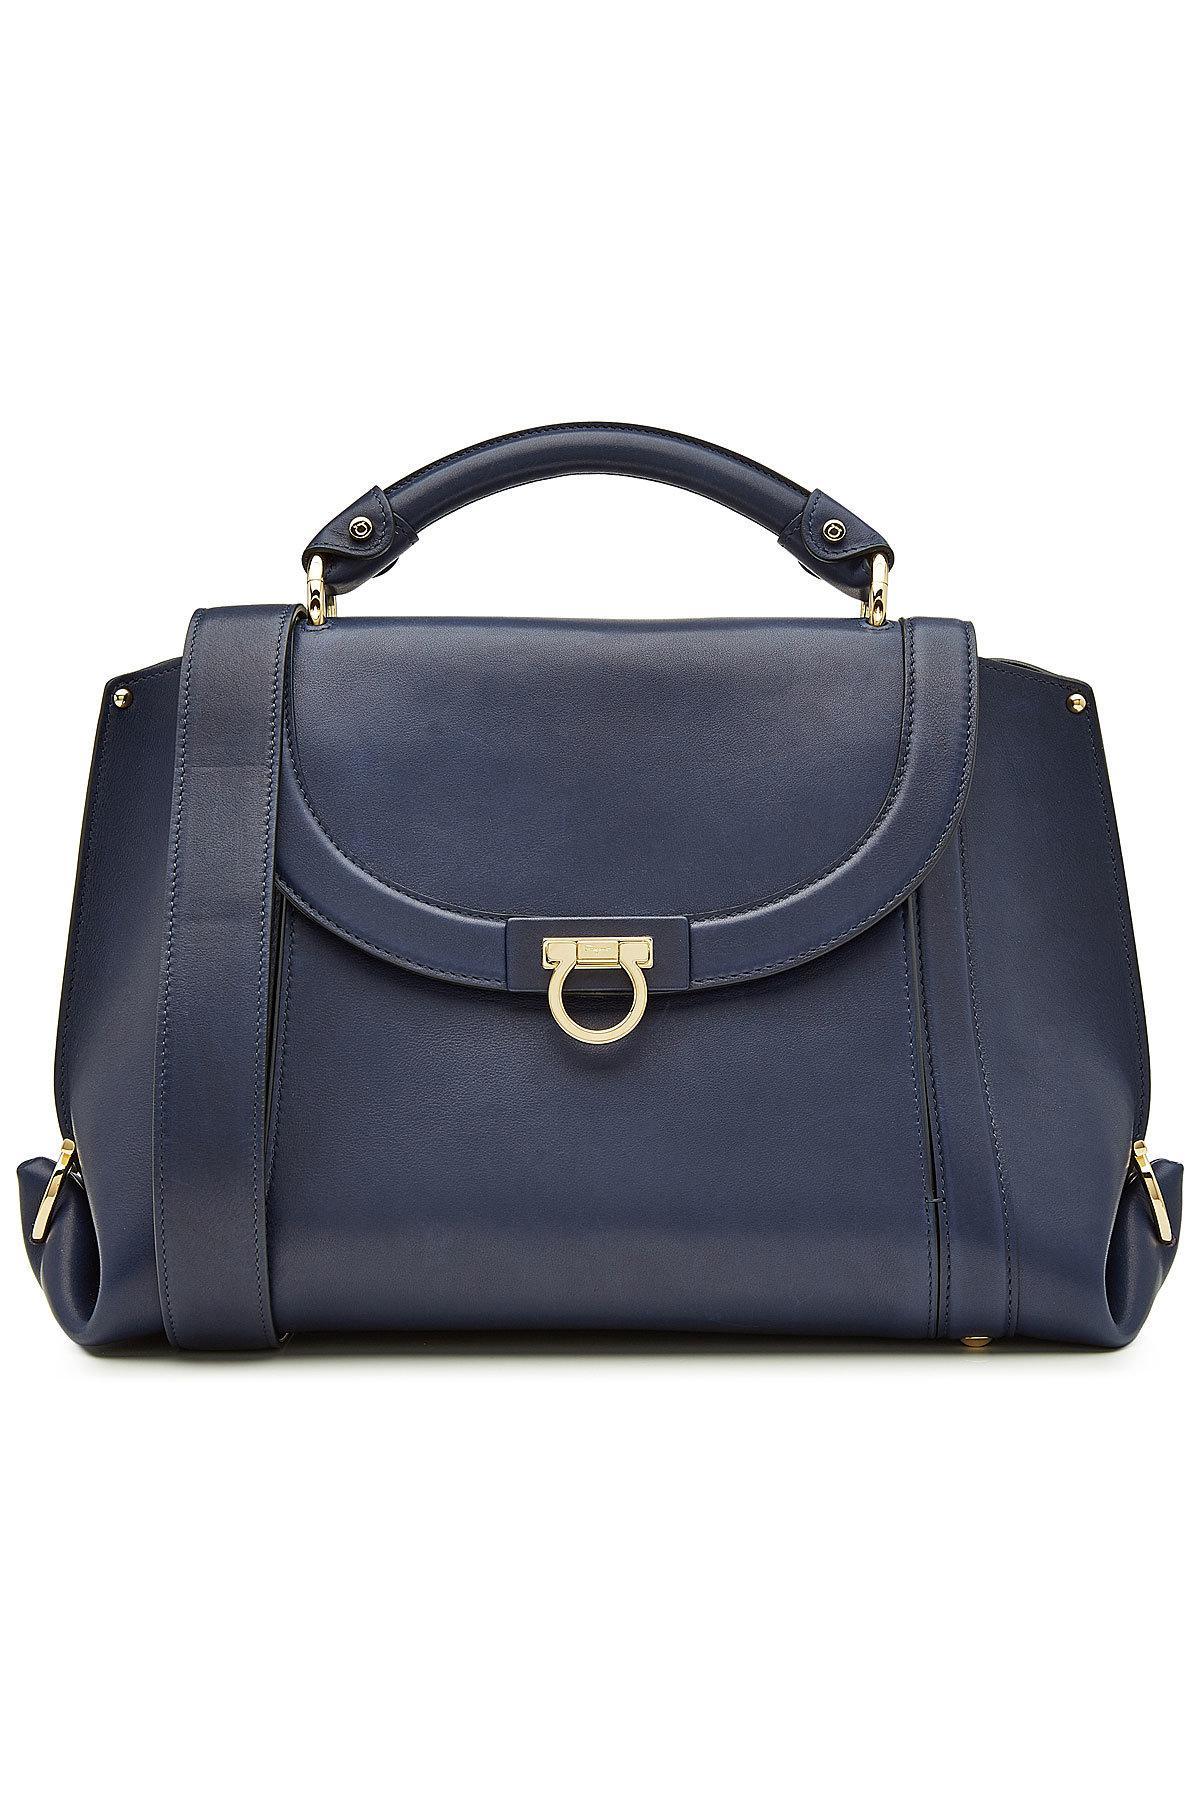 8f22c3ec53 Lyst - Ferragamo Leather Tote in Blue - Save 28%